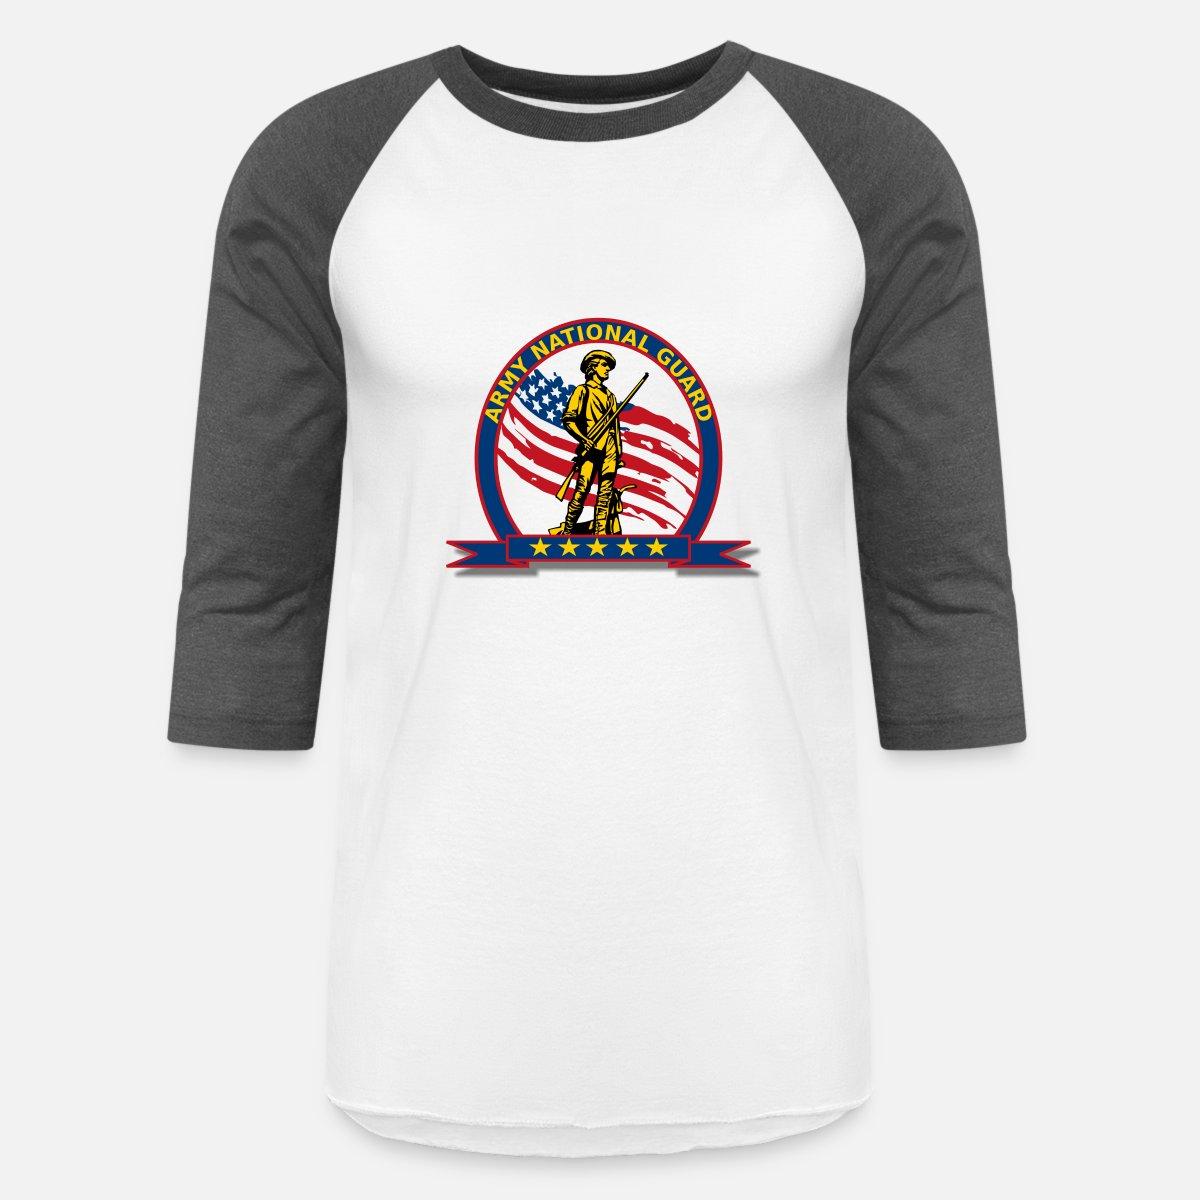 Cheap Army National Guard T Shirts - DREAMWORKS